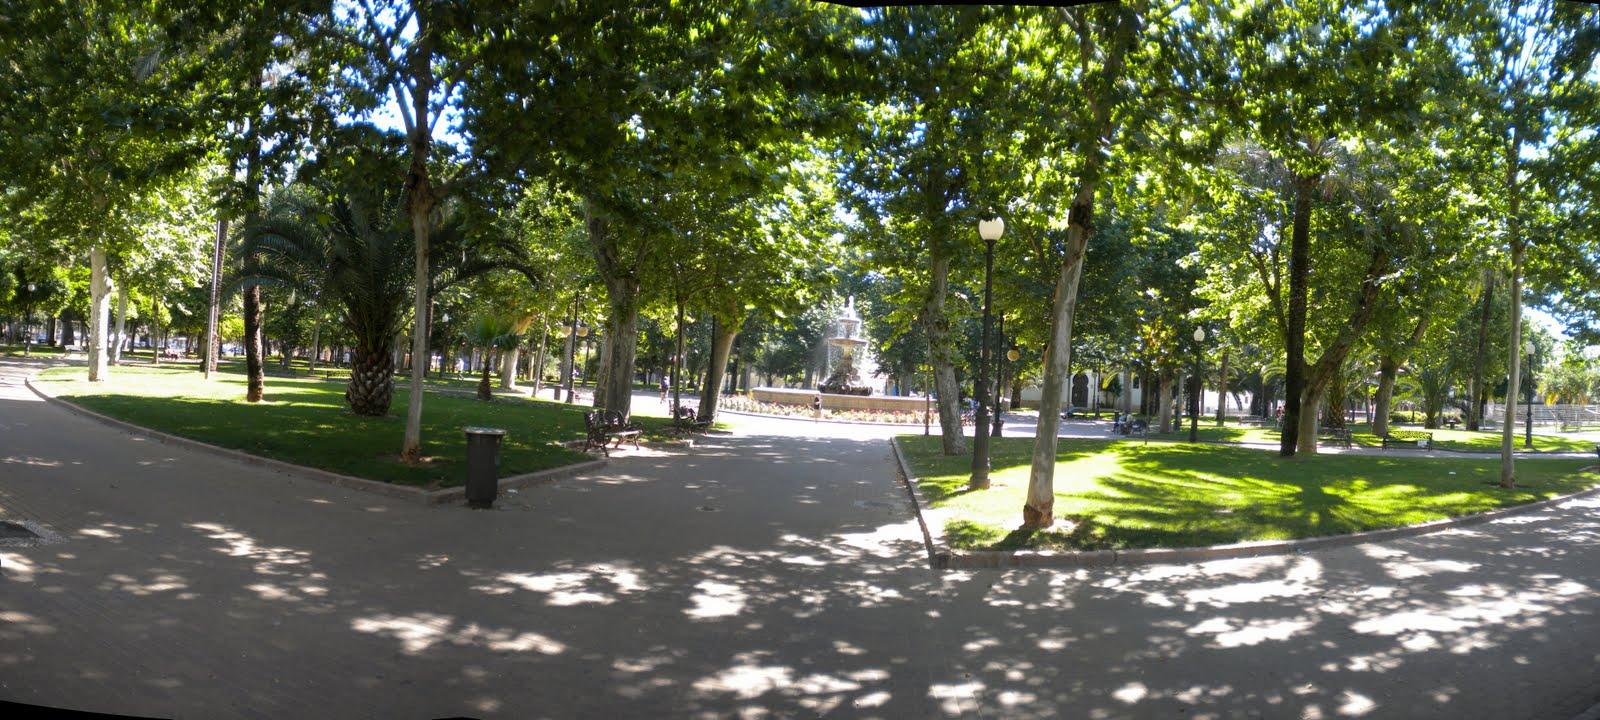 Cordoba encrucijada de culturas jardines de colon for Jardines en cordoba capital